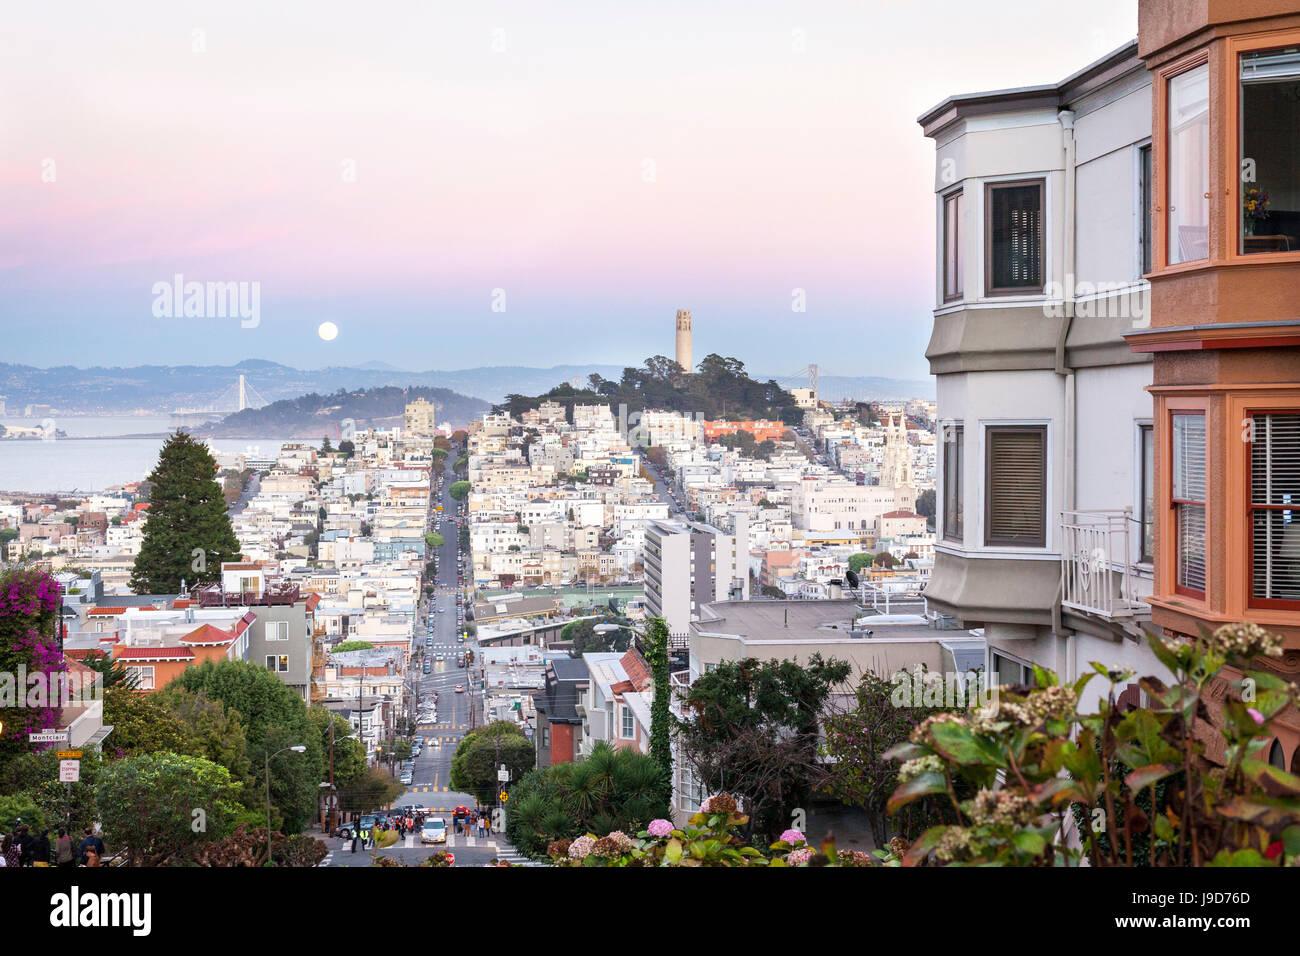 Super pleine Lune et vue de Bay Area, y compris San Francisco-Oakland Bay Bridge, San Francisco, California, USA Photo Stock